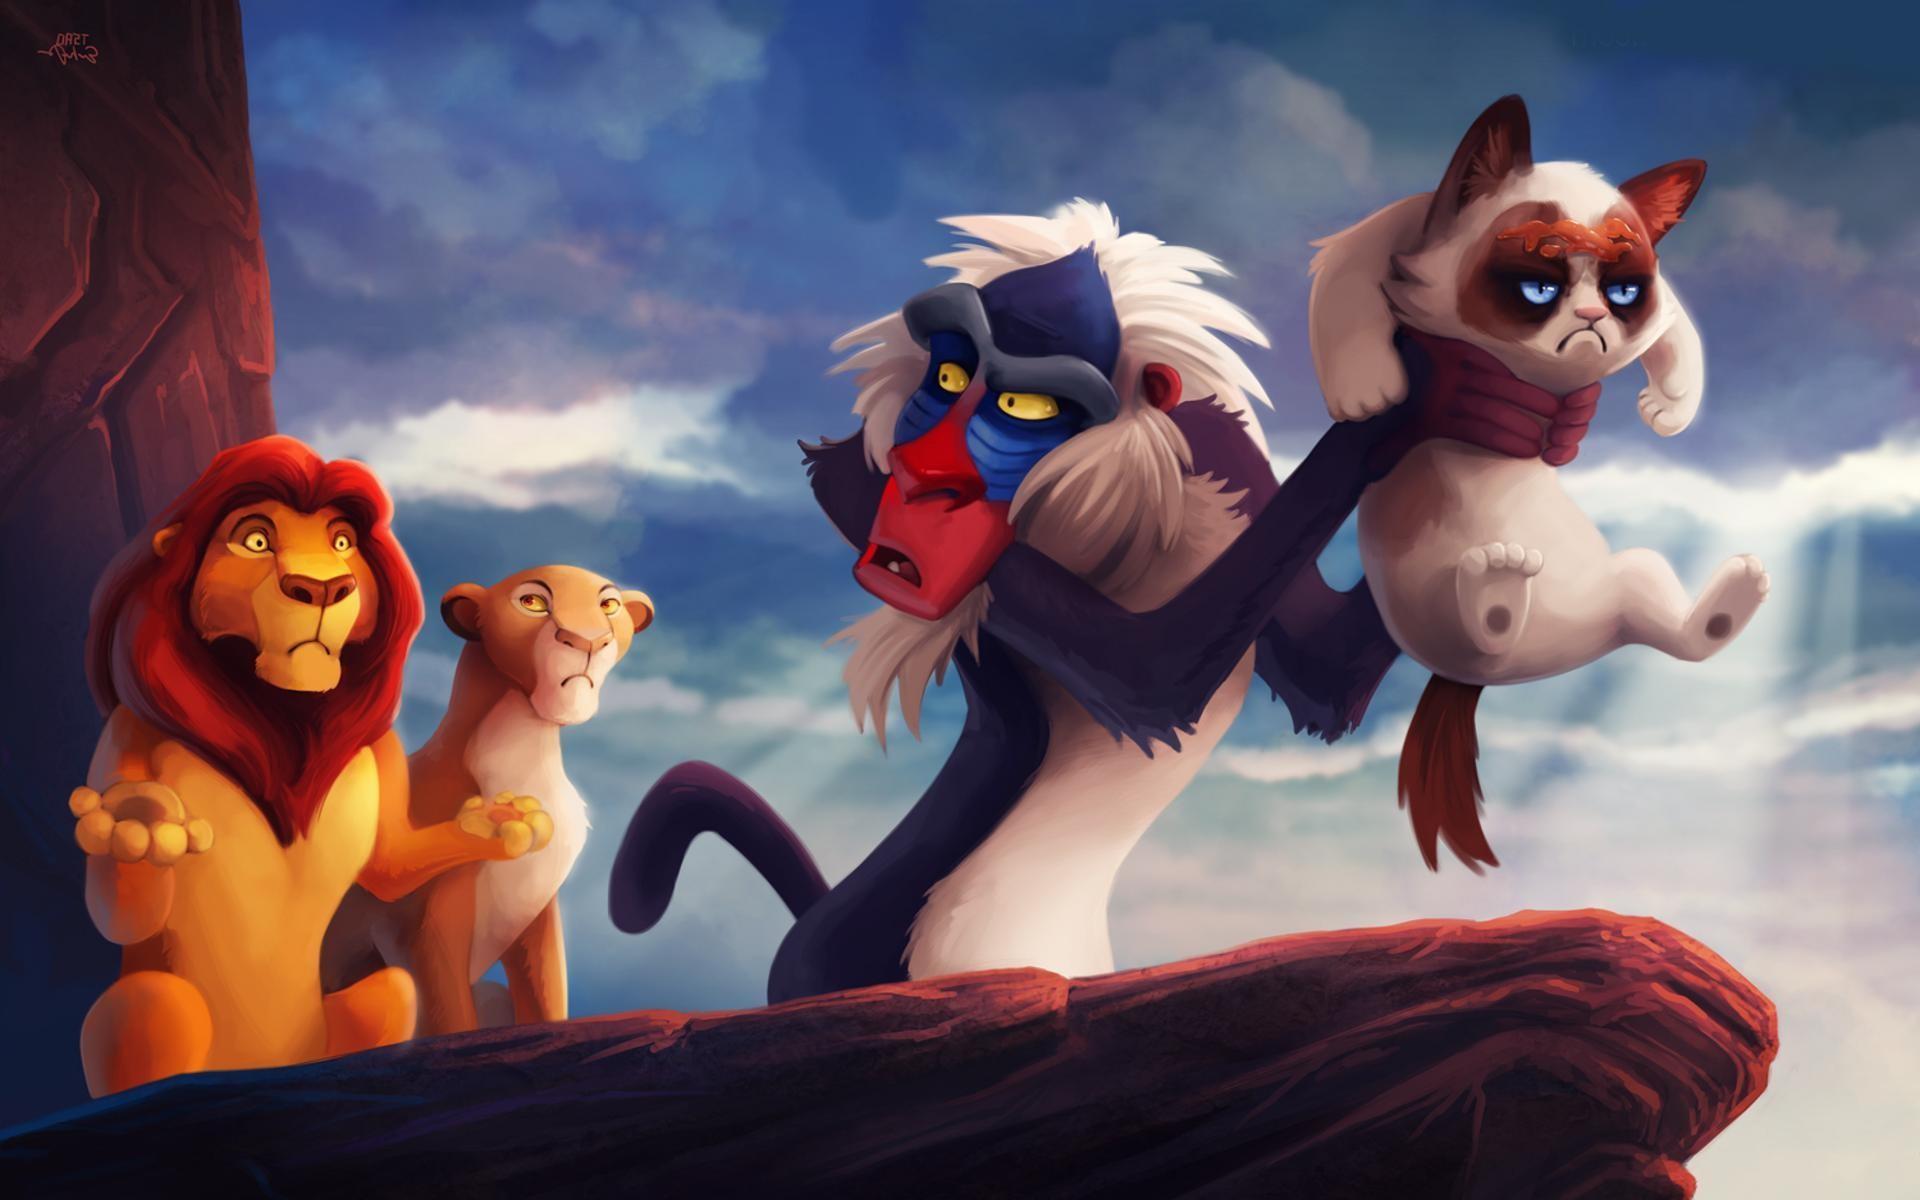 Animals Wallpaper: Grumpy Cat Wallpapers HD Resolution for HD .